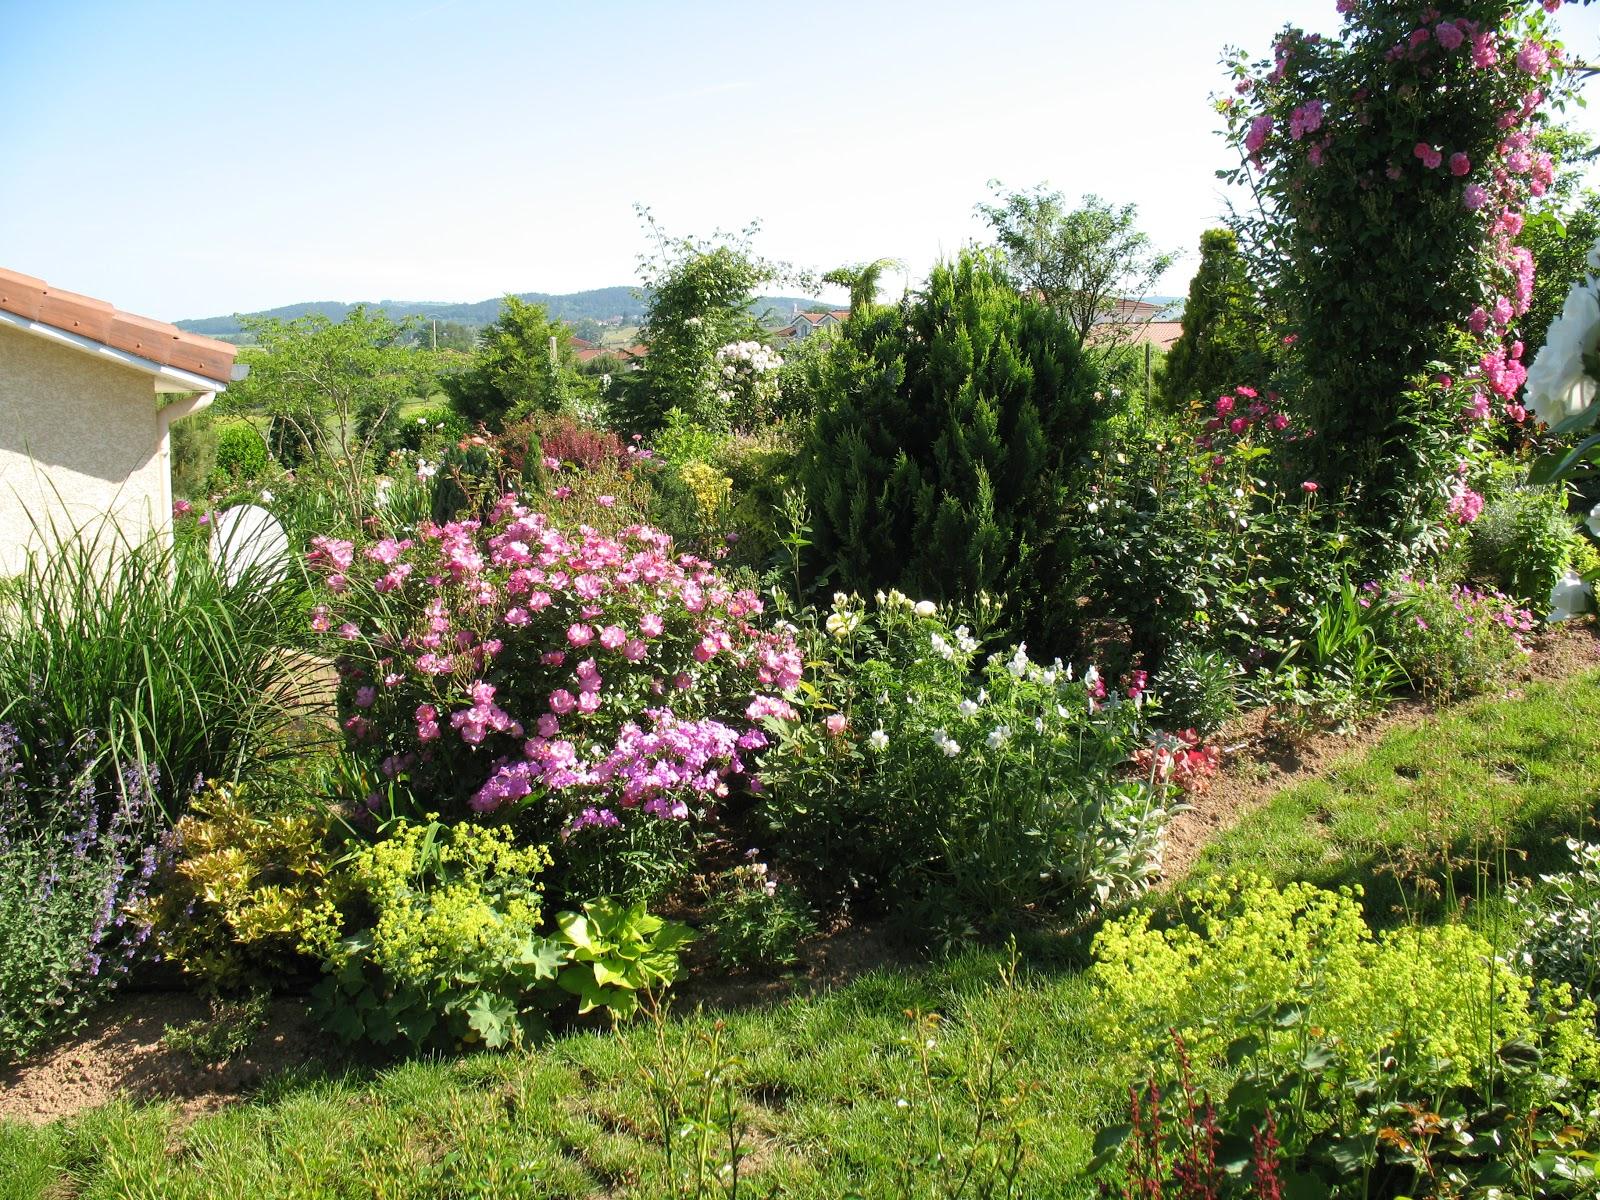 roses du jardin ch neland lavender dream dans son d cor. Black Bedroom Furniture Sets. Home Design Ideas